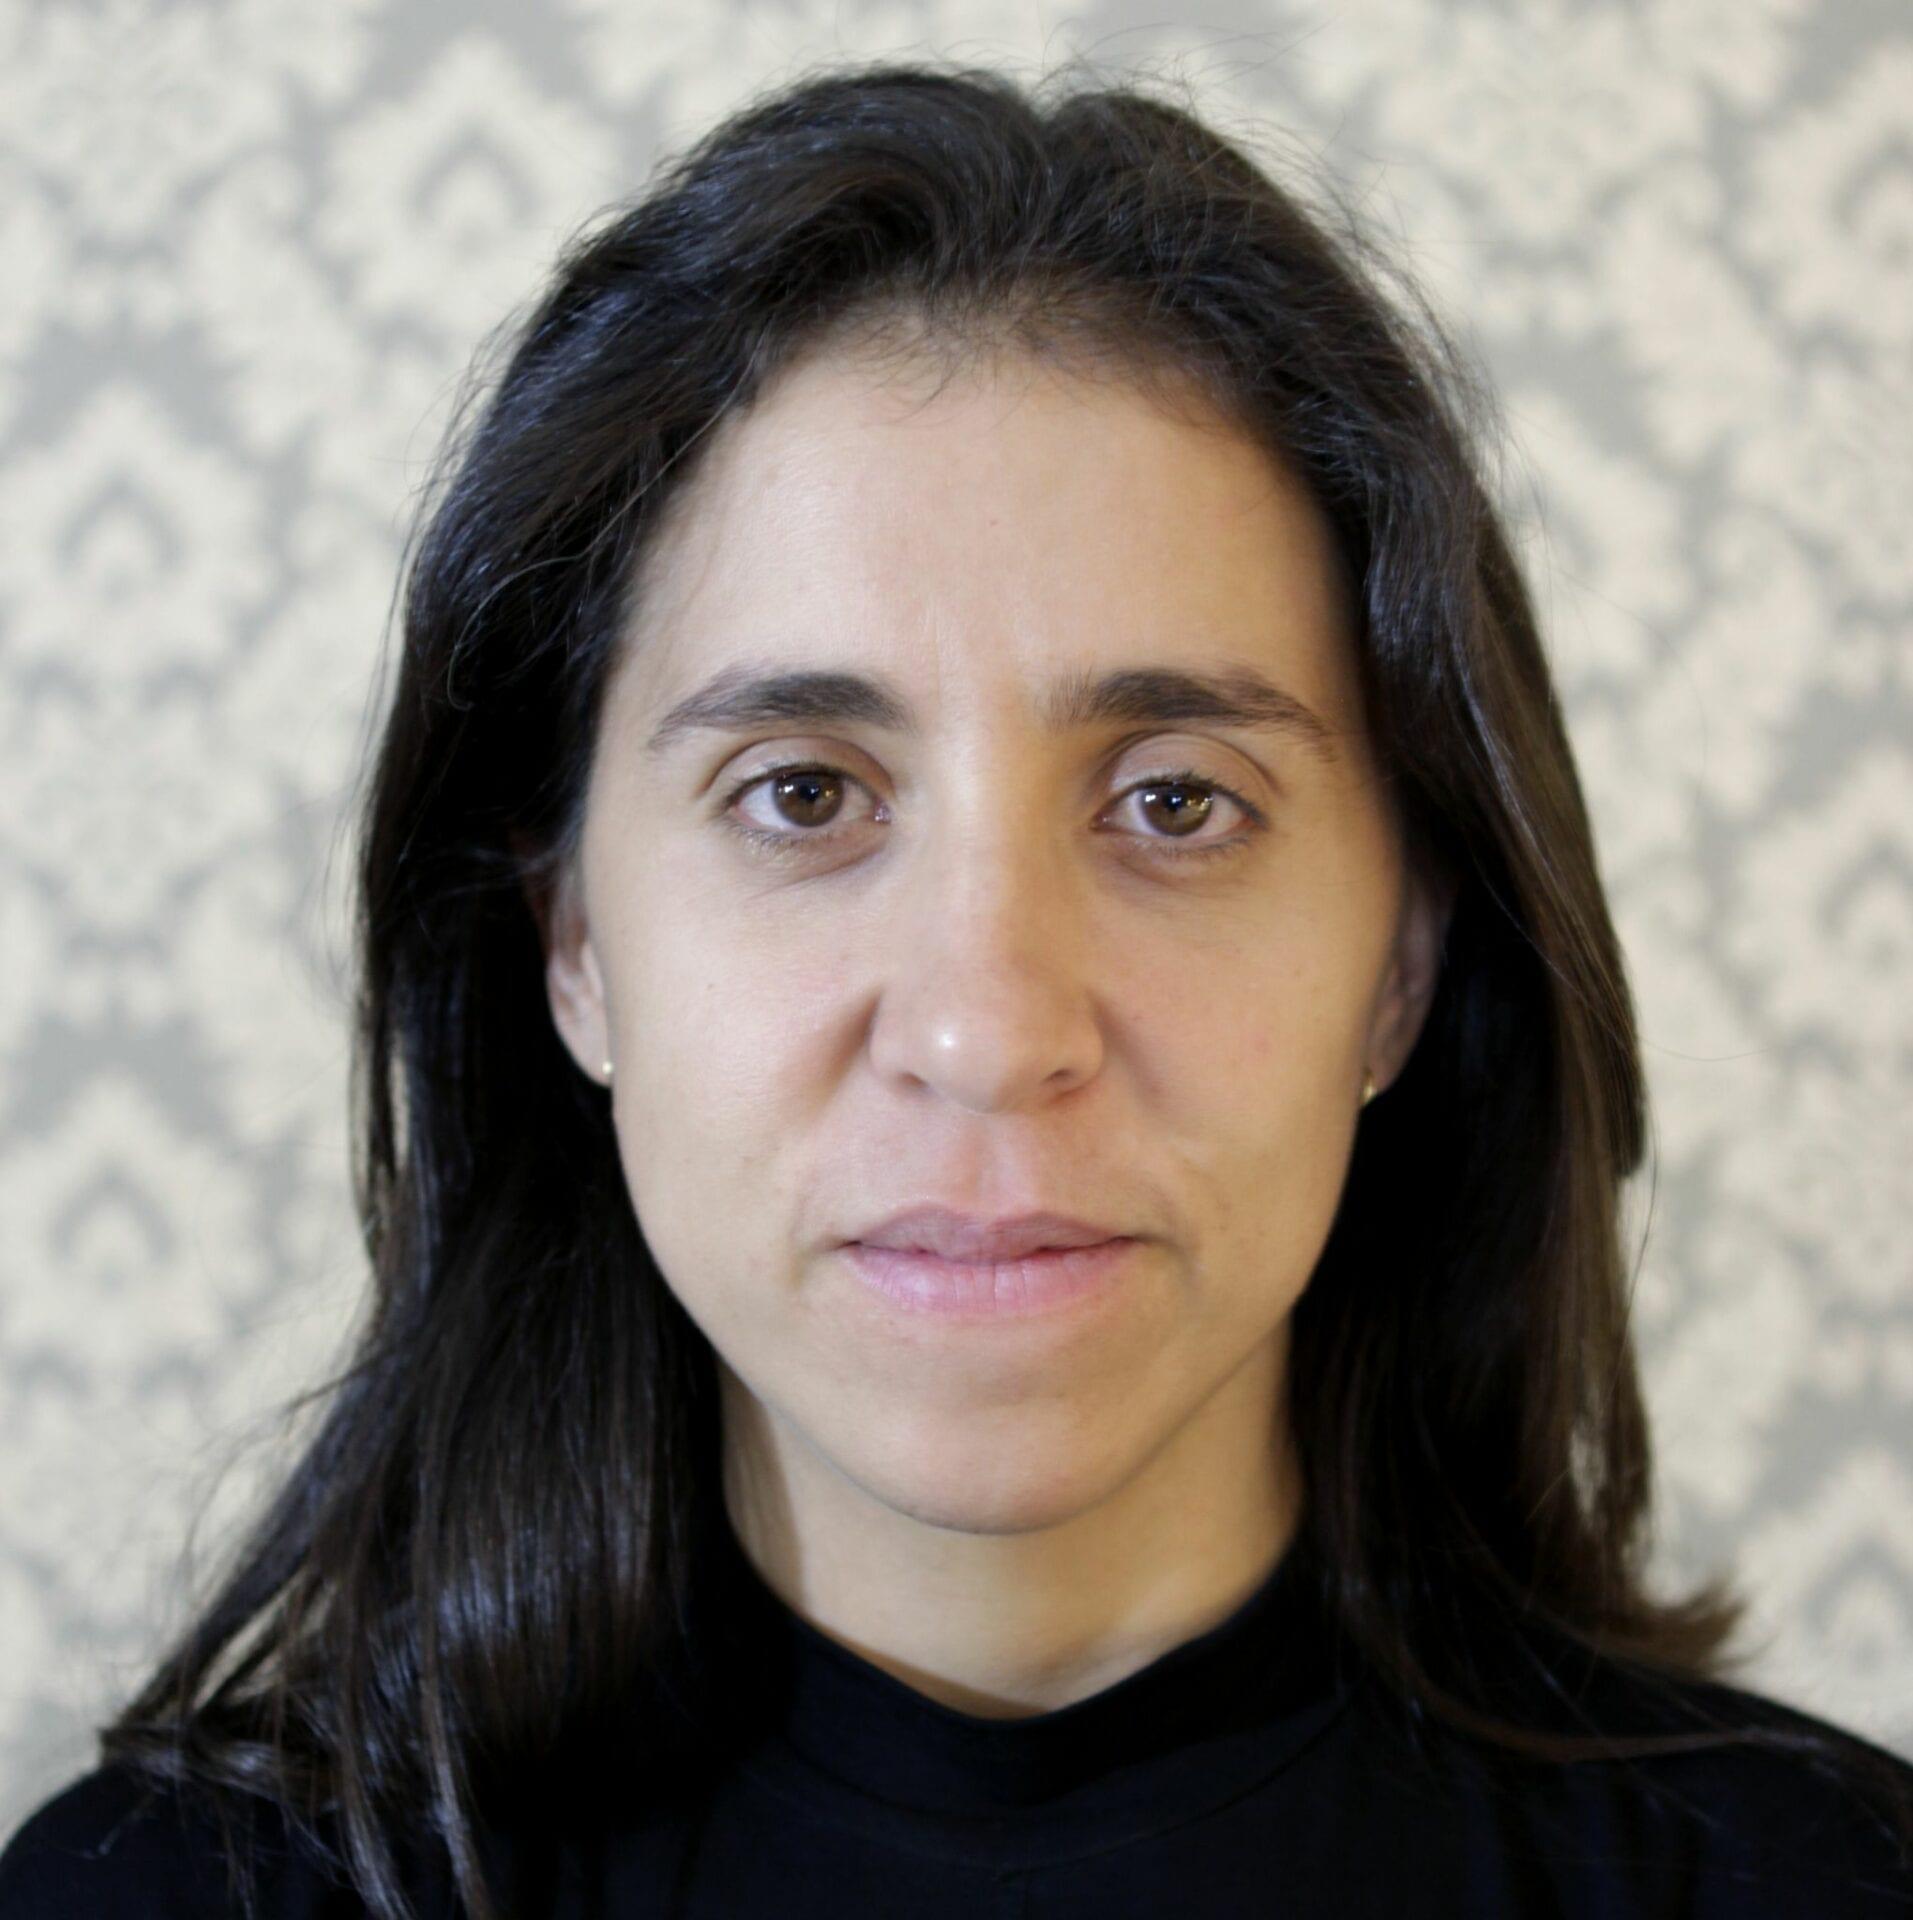 Patricia Roda